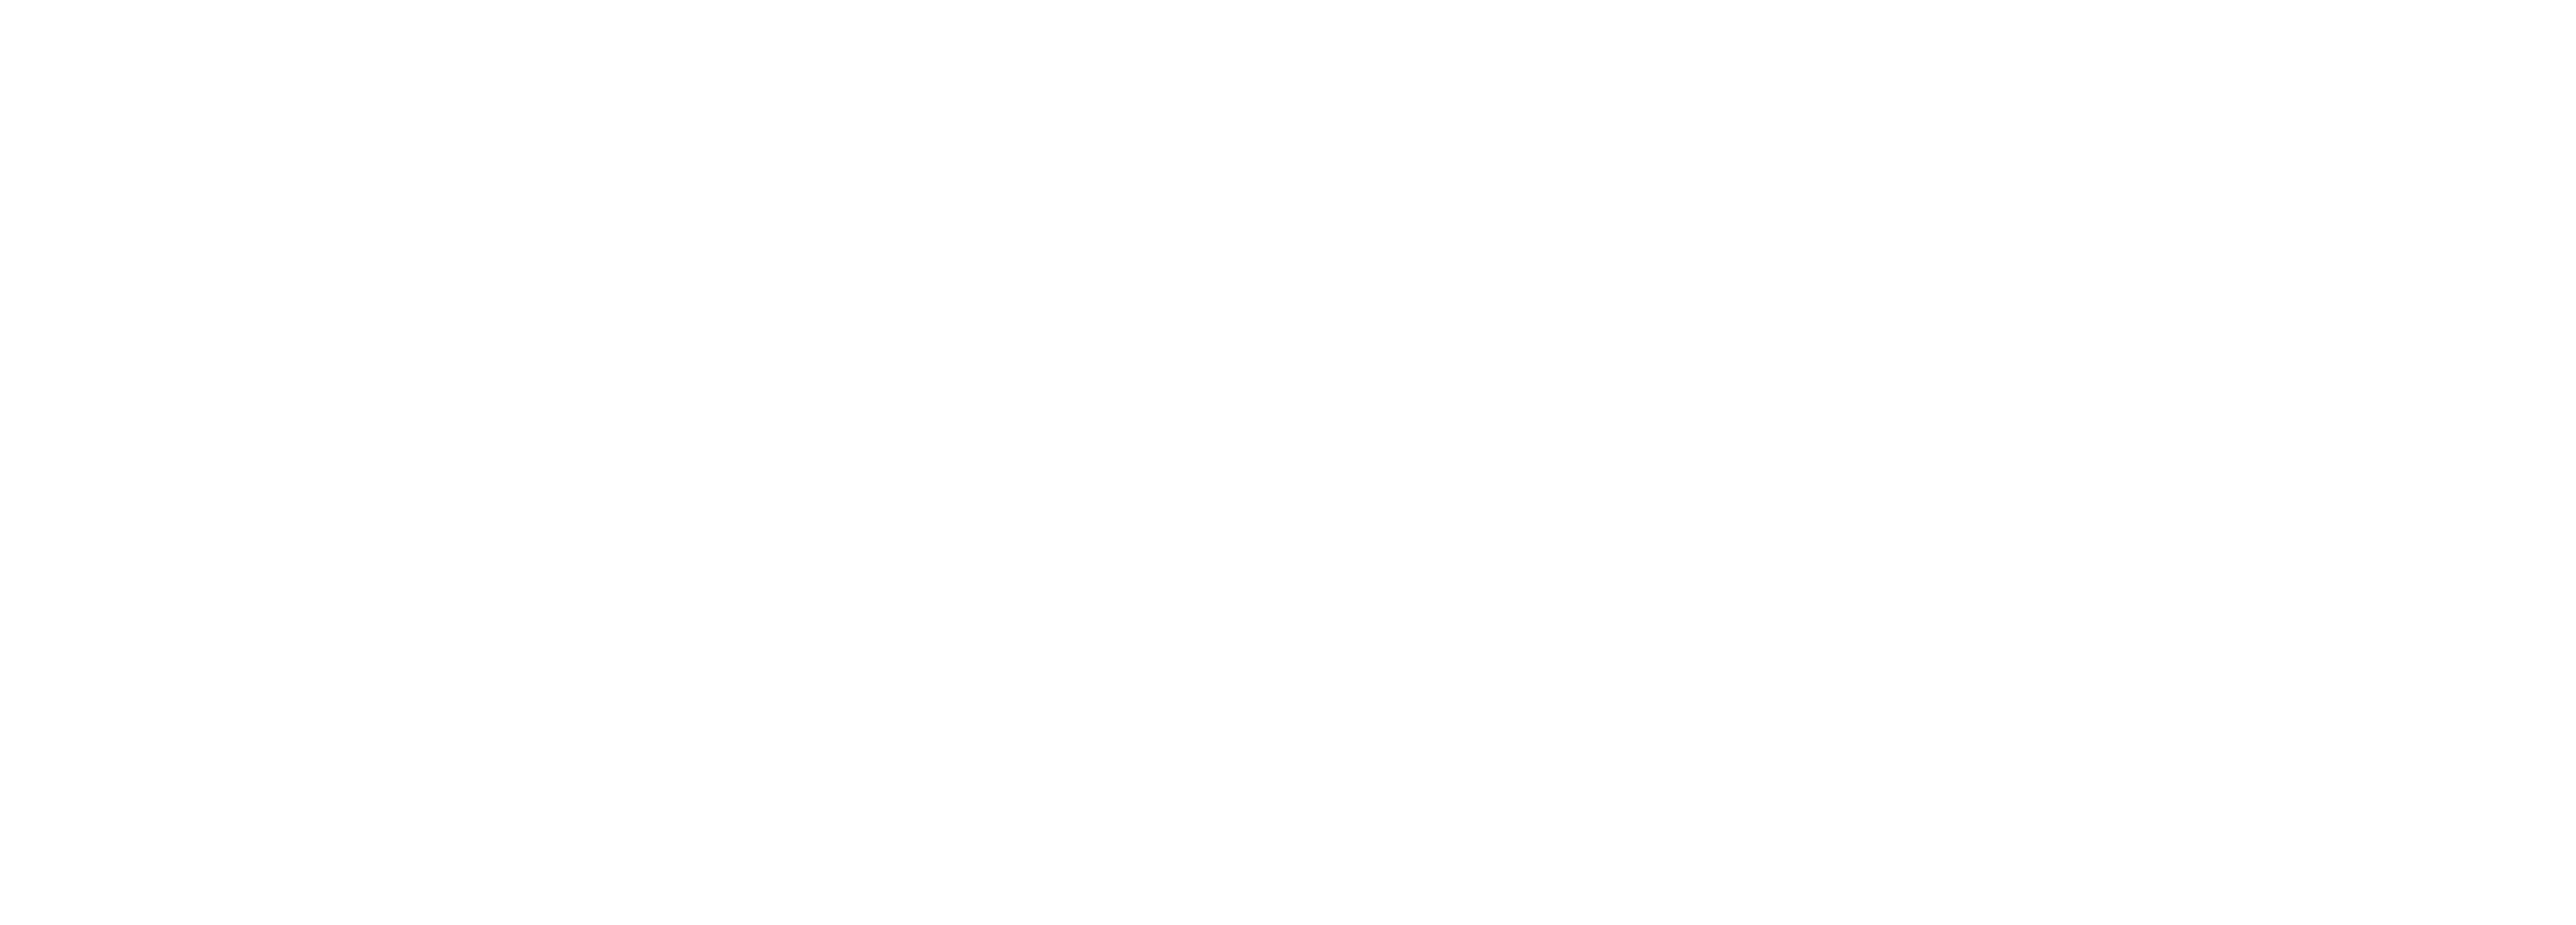 DIFF MAIN LOGO WHT Media Files logo and banner media files